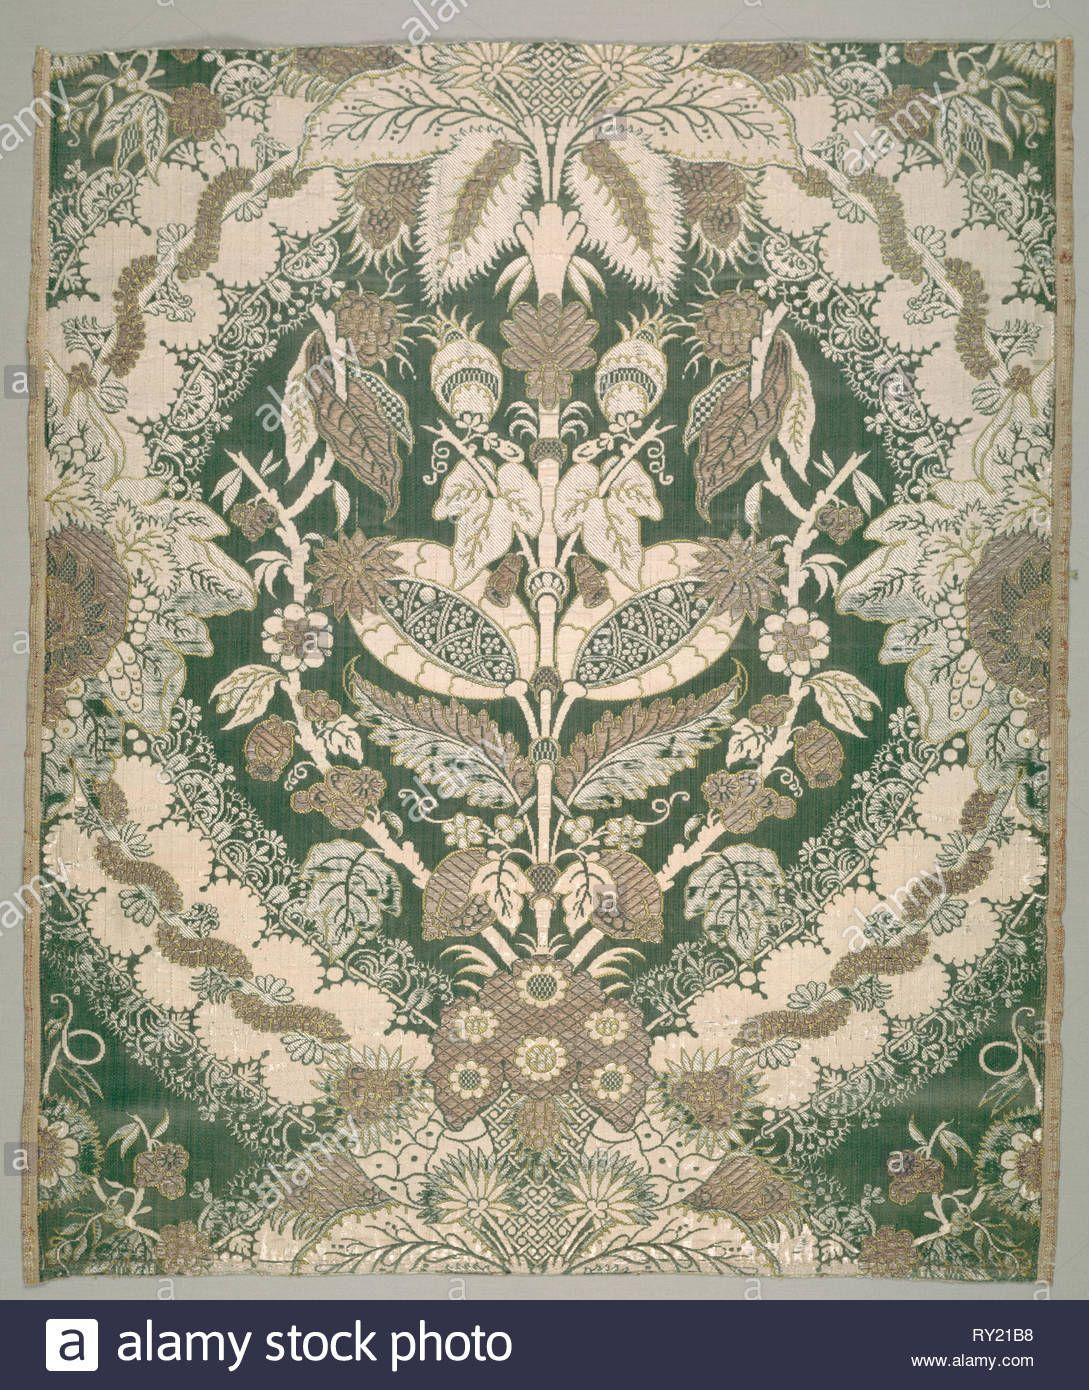 Textiles De Barroco Cleveland Museum Of Art Textiles Art